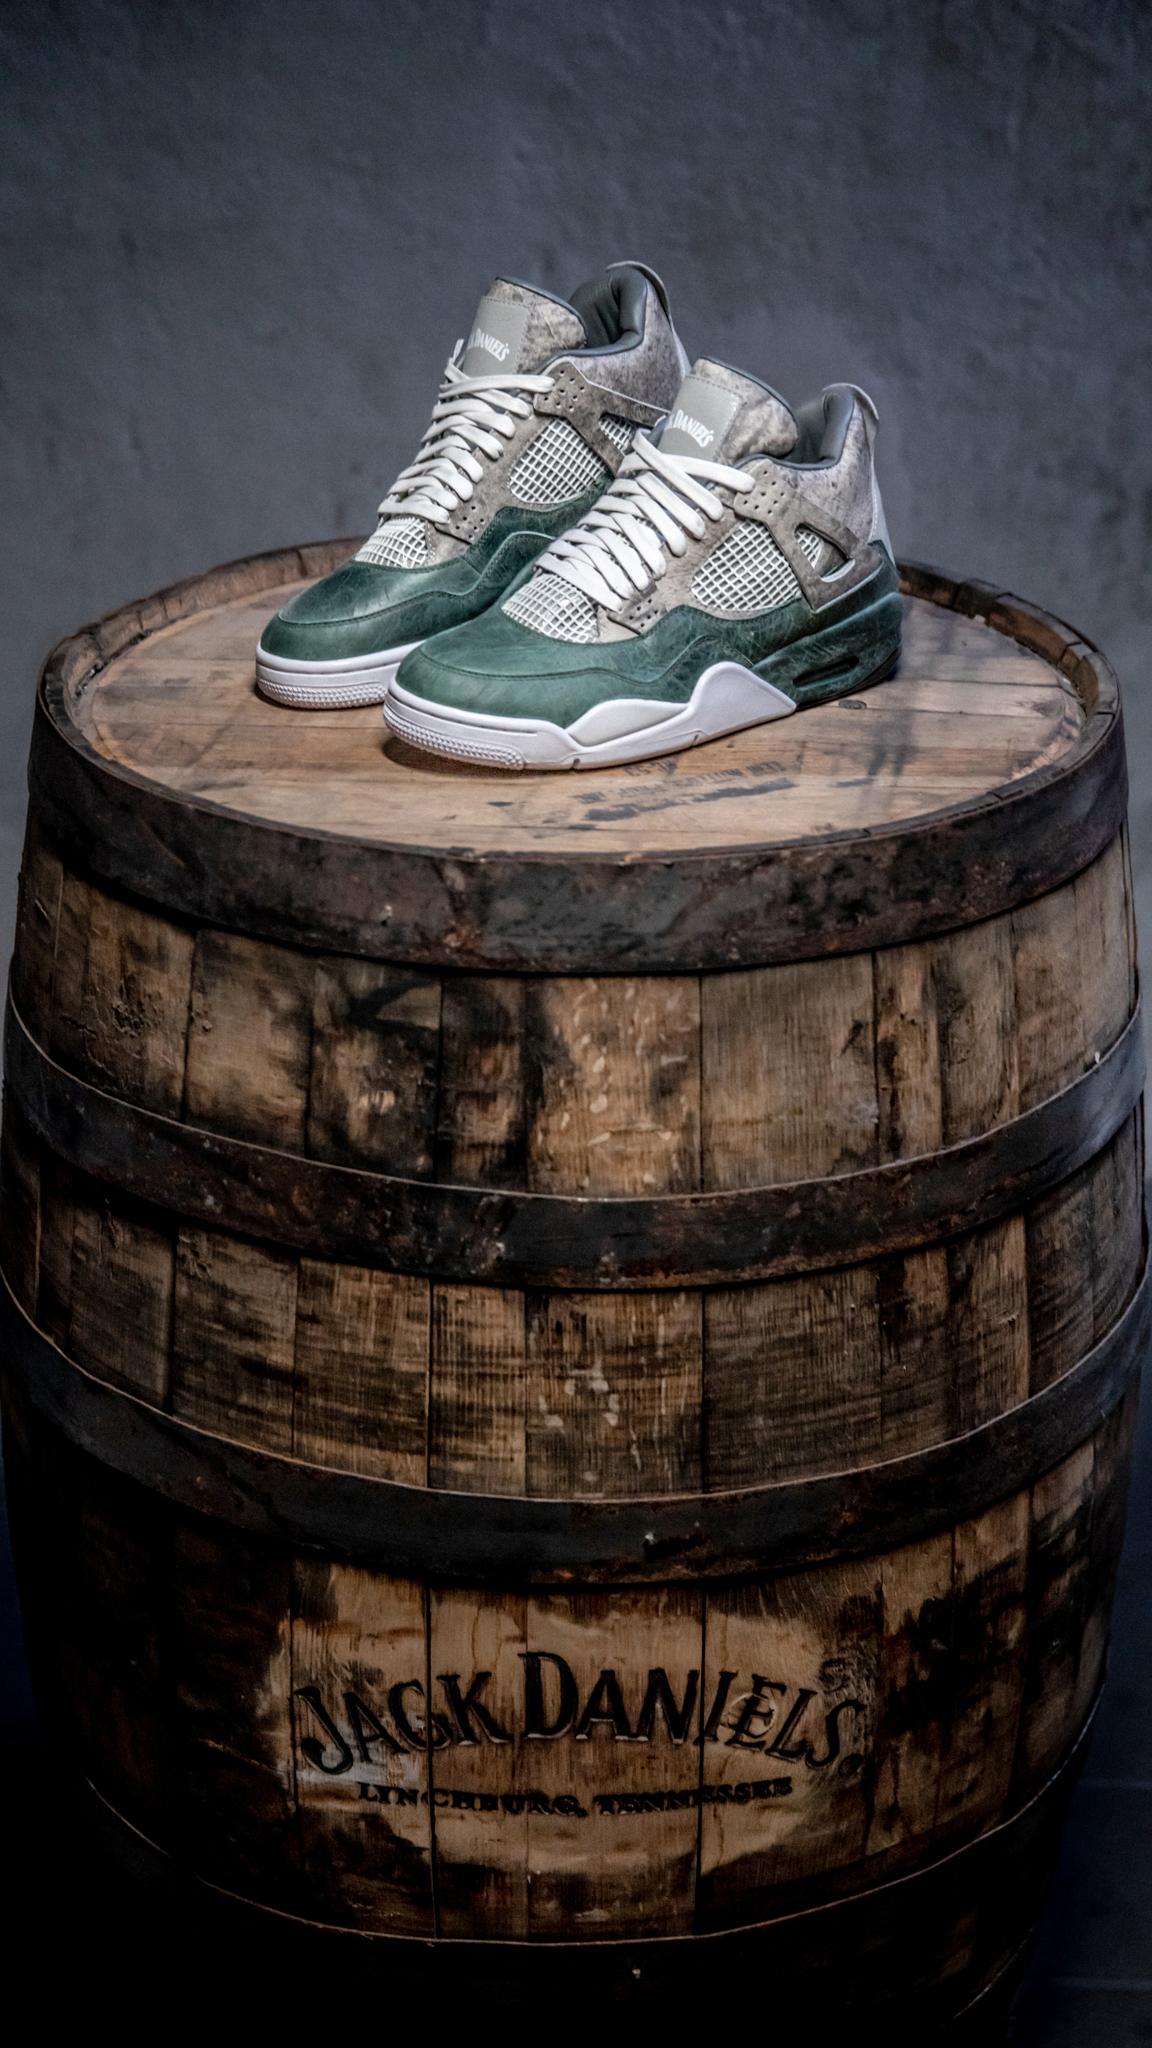 Jack Daniels x The Shoe Surgeon Partnership